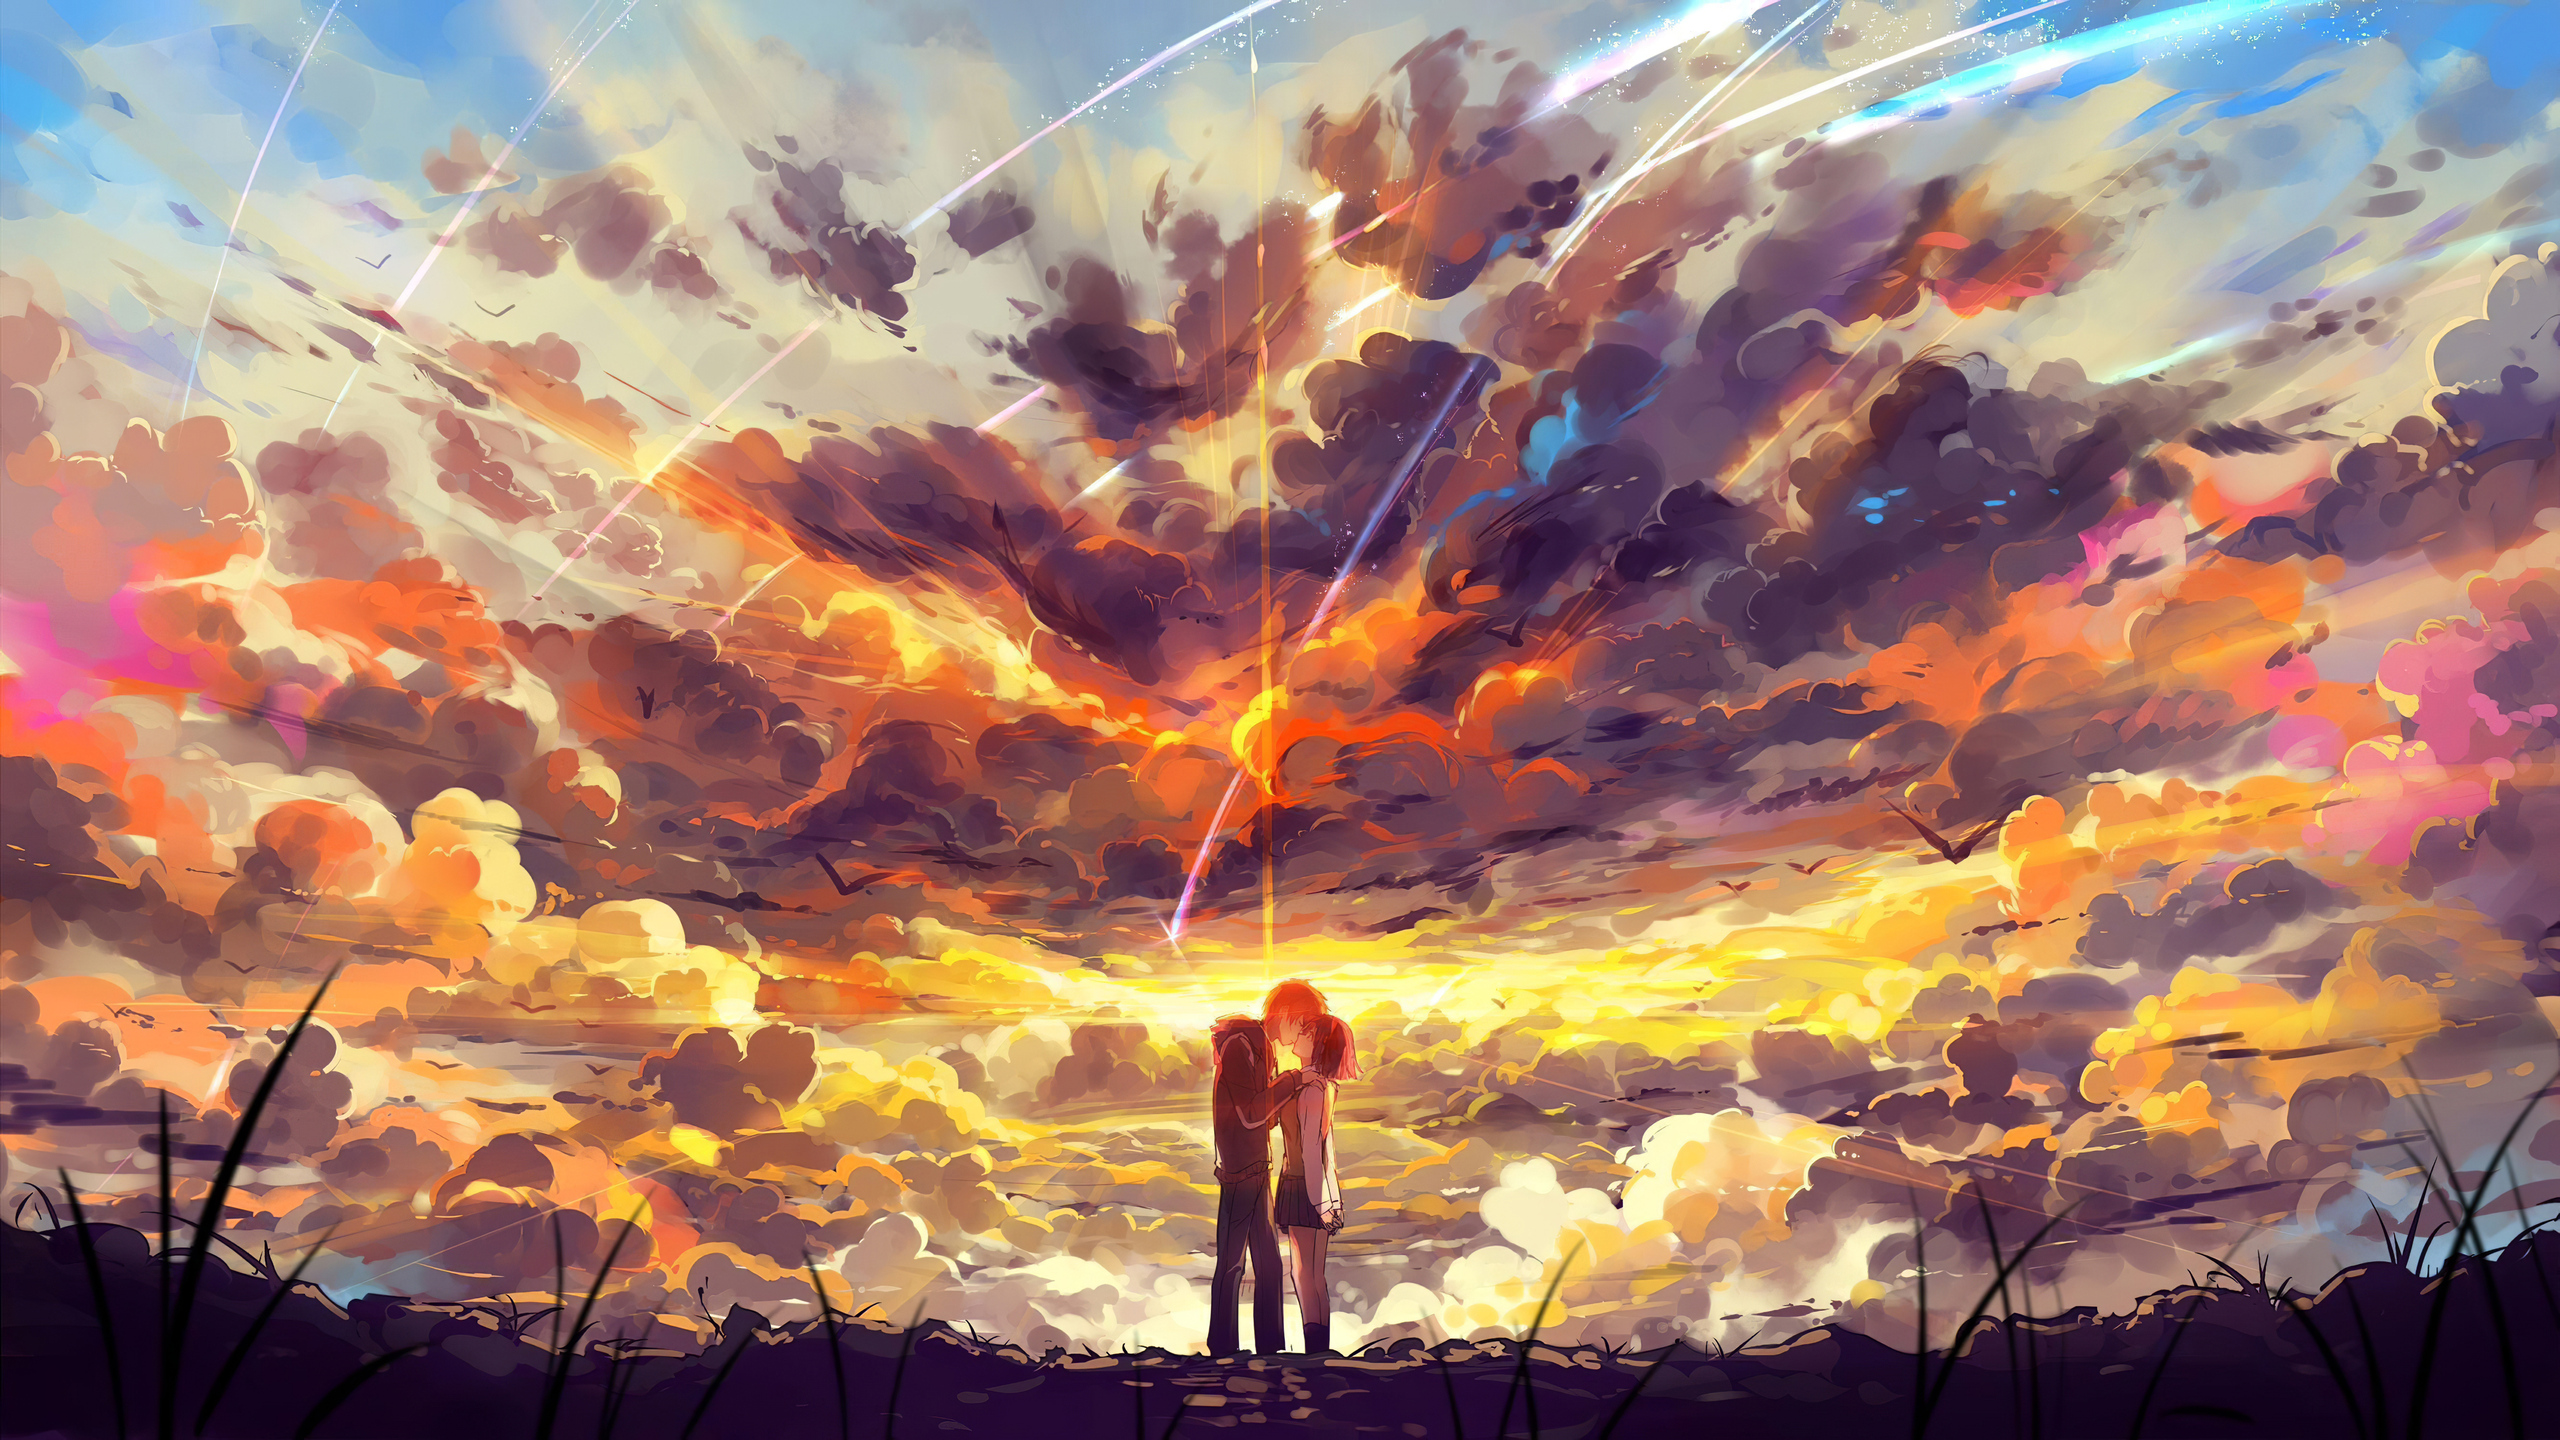 kimi-no-nawa-anime-couple-5k-3l.jpg